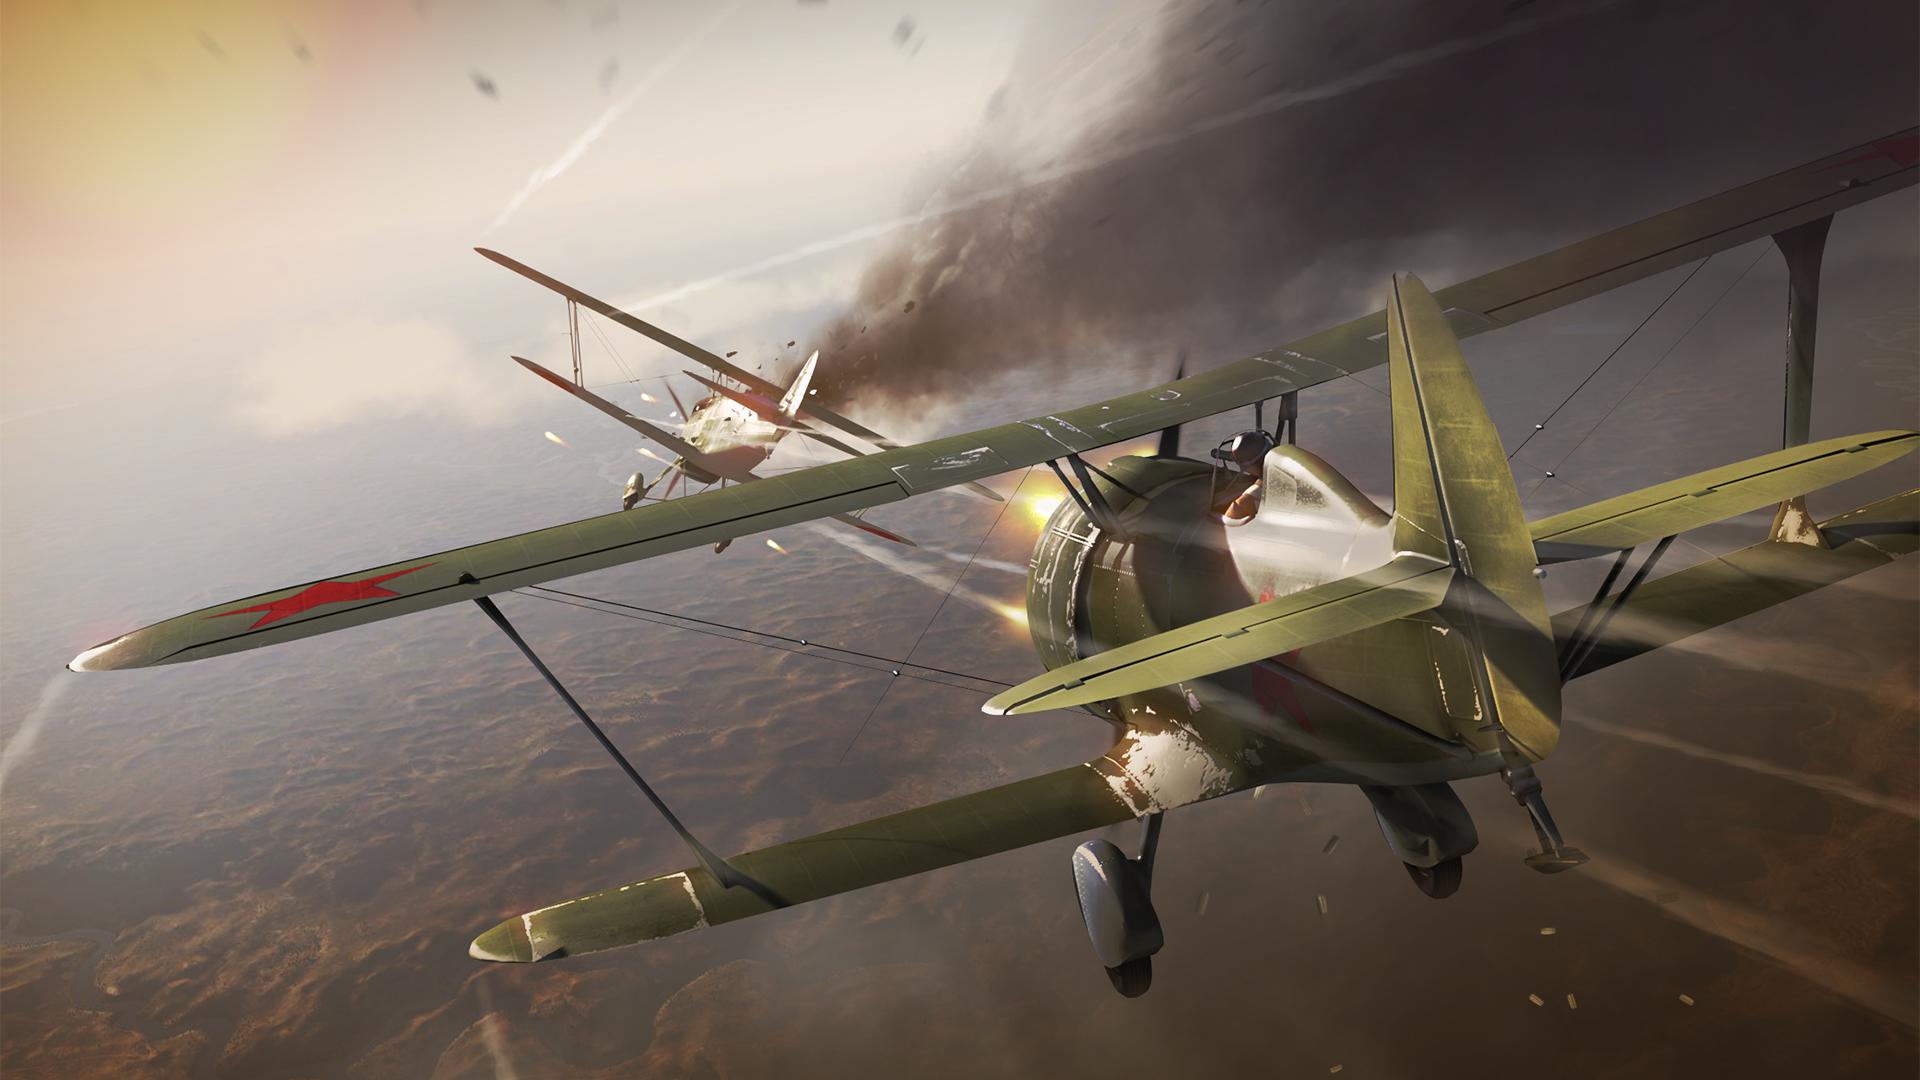 Image War Thunder Airplane I-15 3D Graphics Games 1920x1080